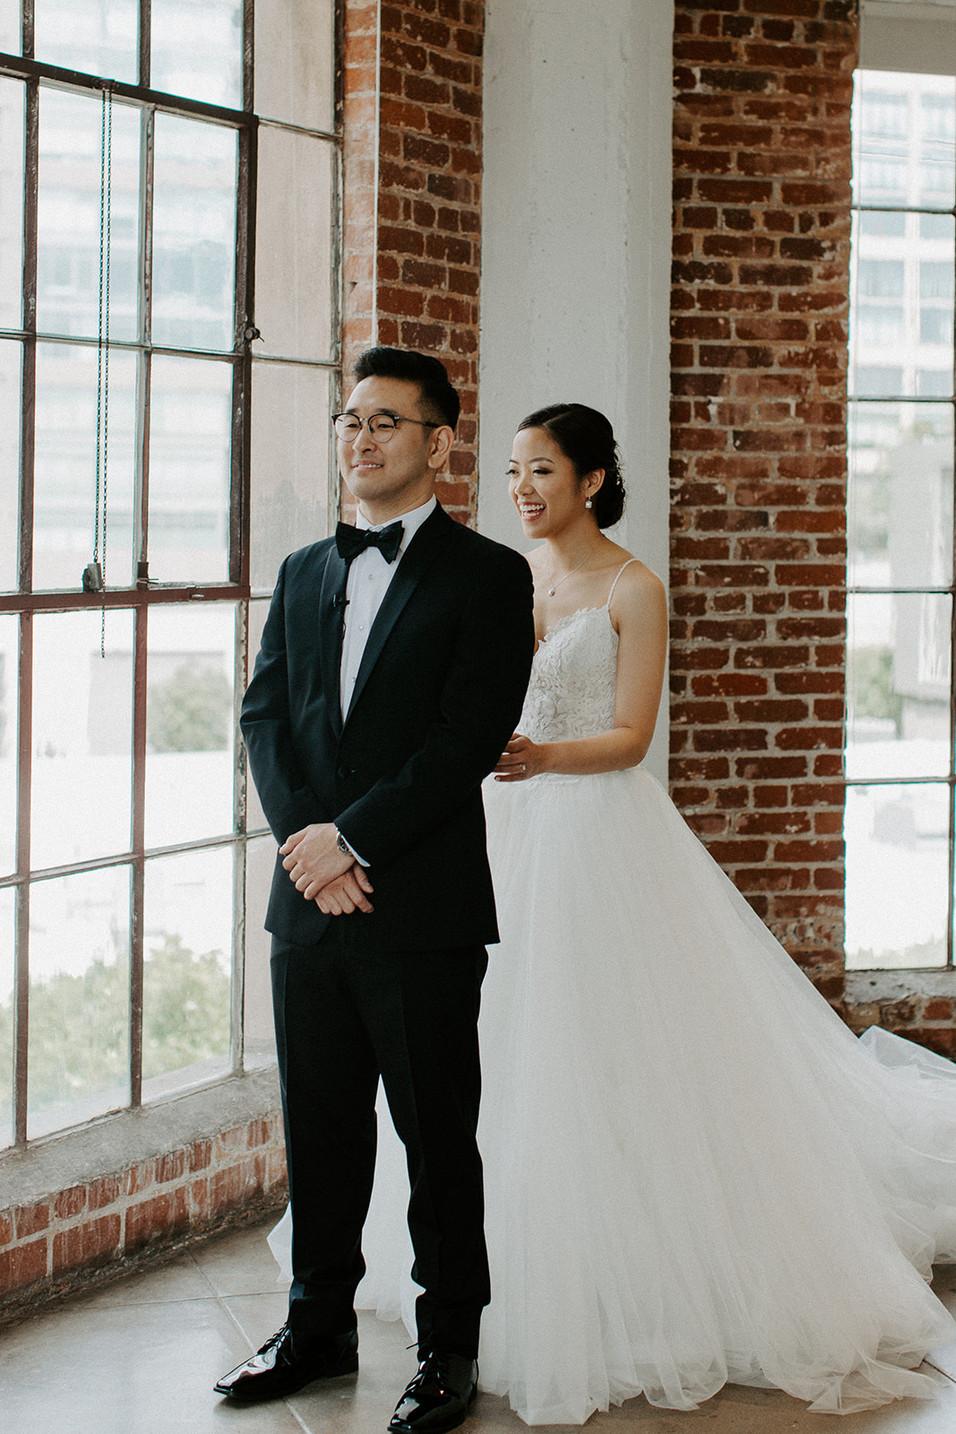 charmaine_ben_wedding_0208_websize.jpg